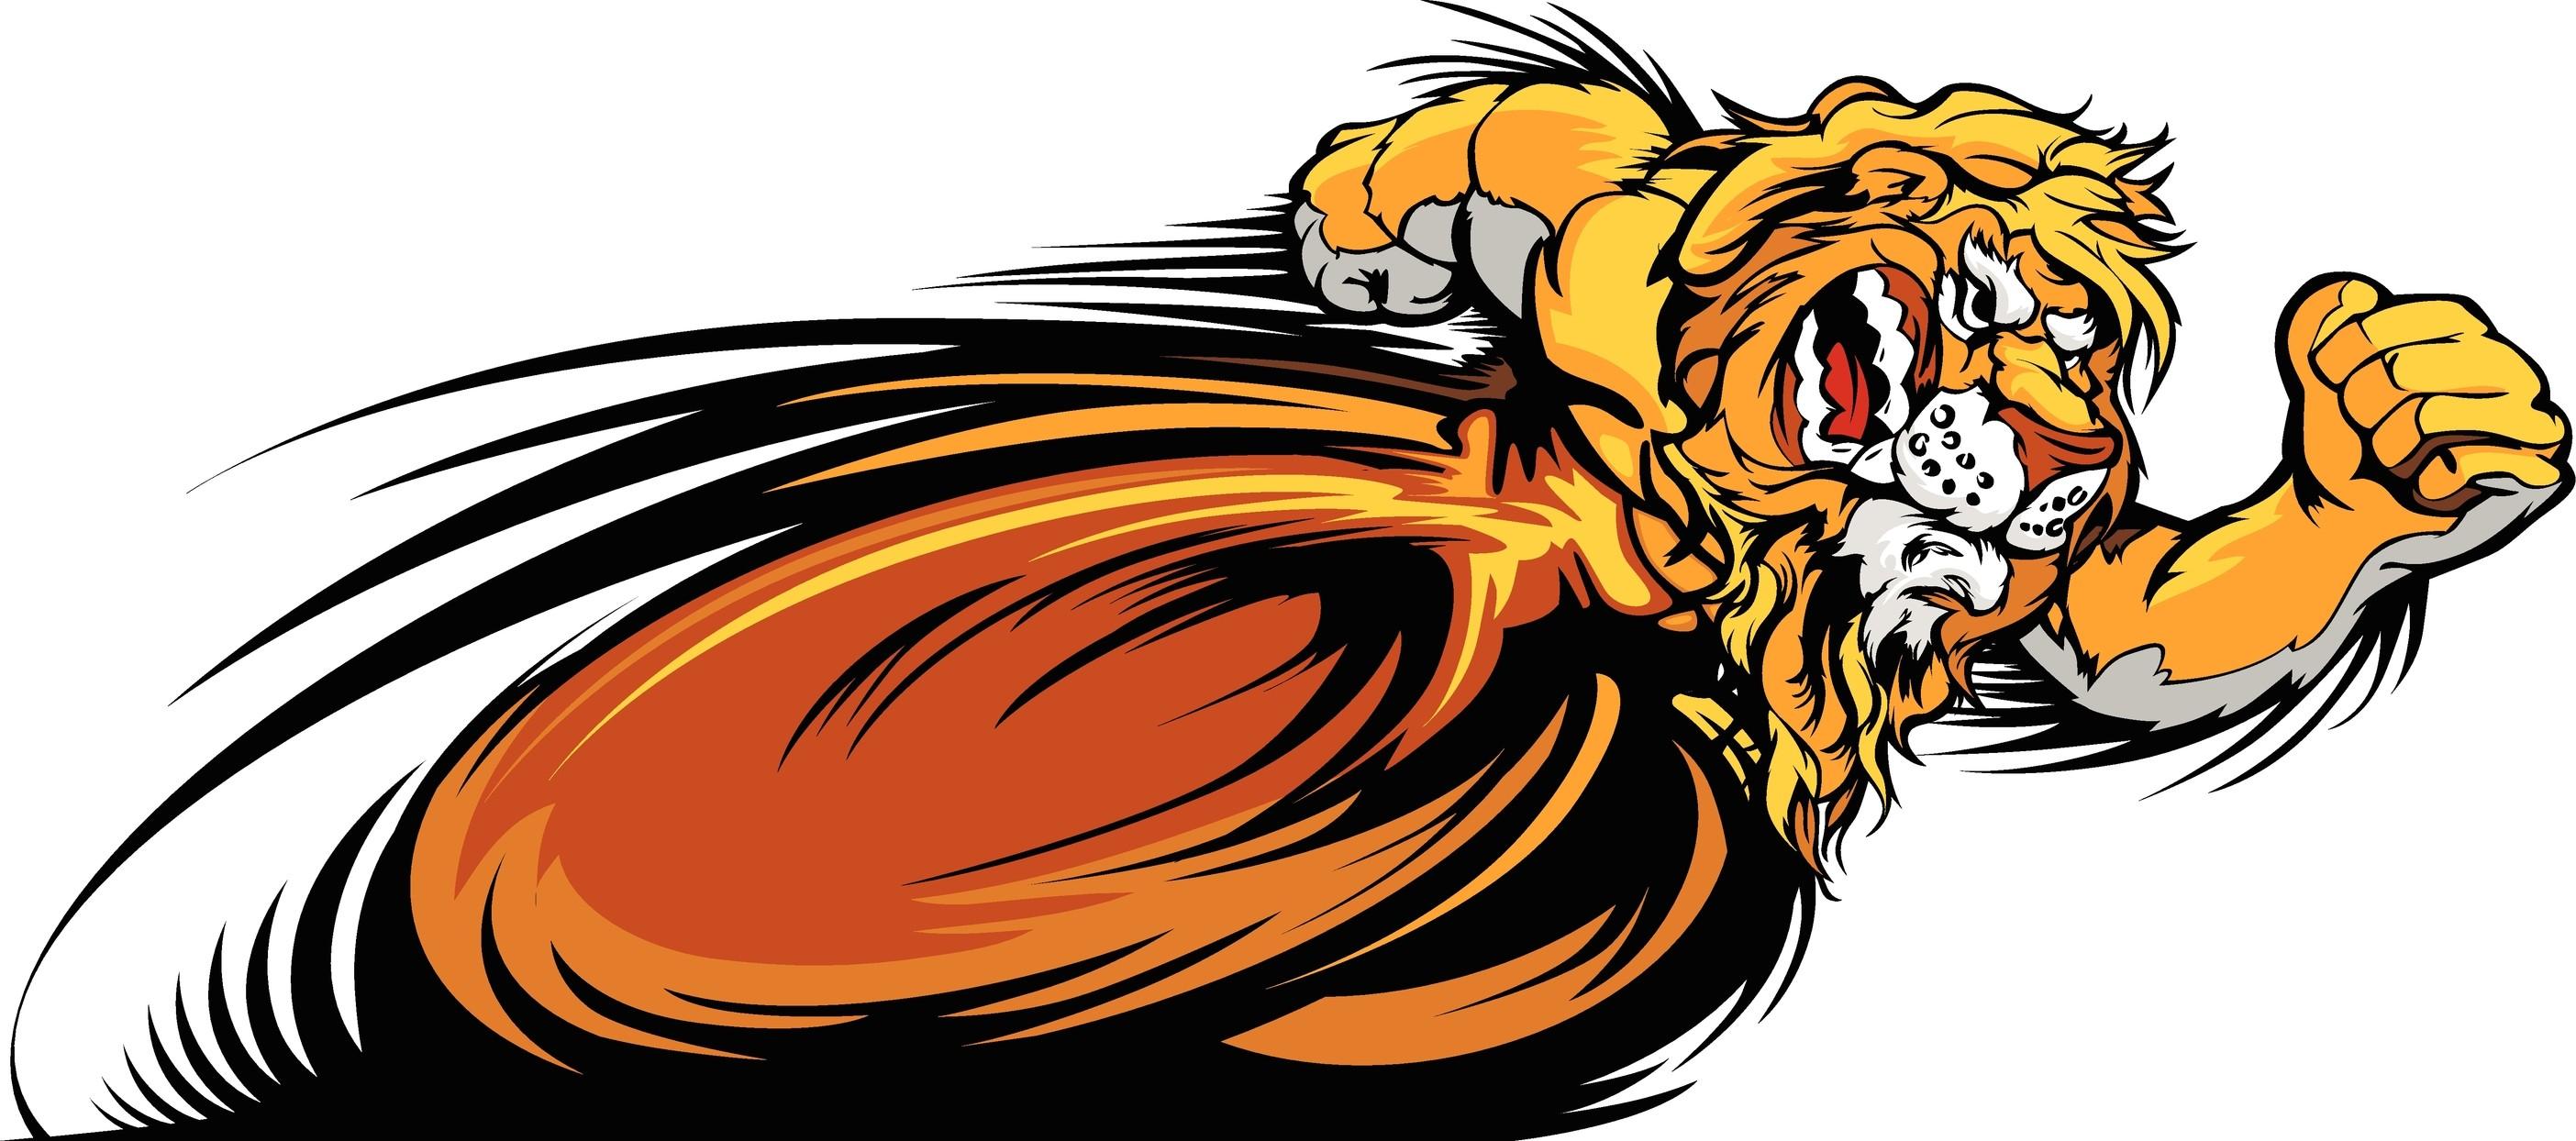 images.raceentry.com/infopages/hudson-lions-prowl-5k-infopages-843.jpg